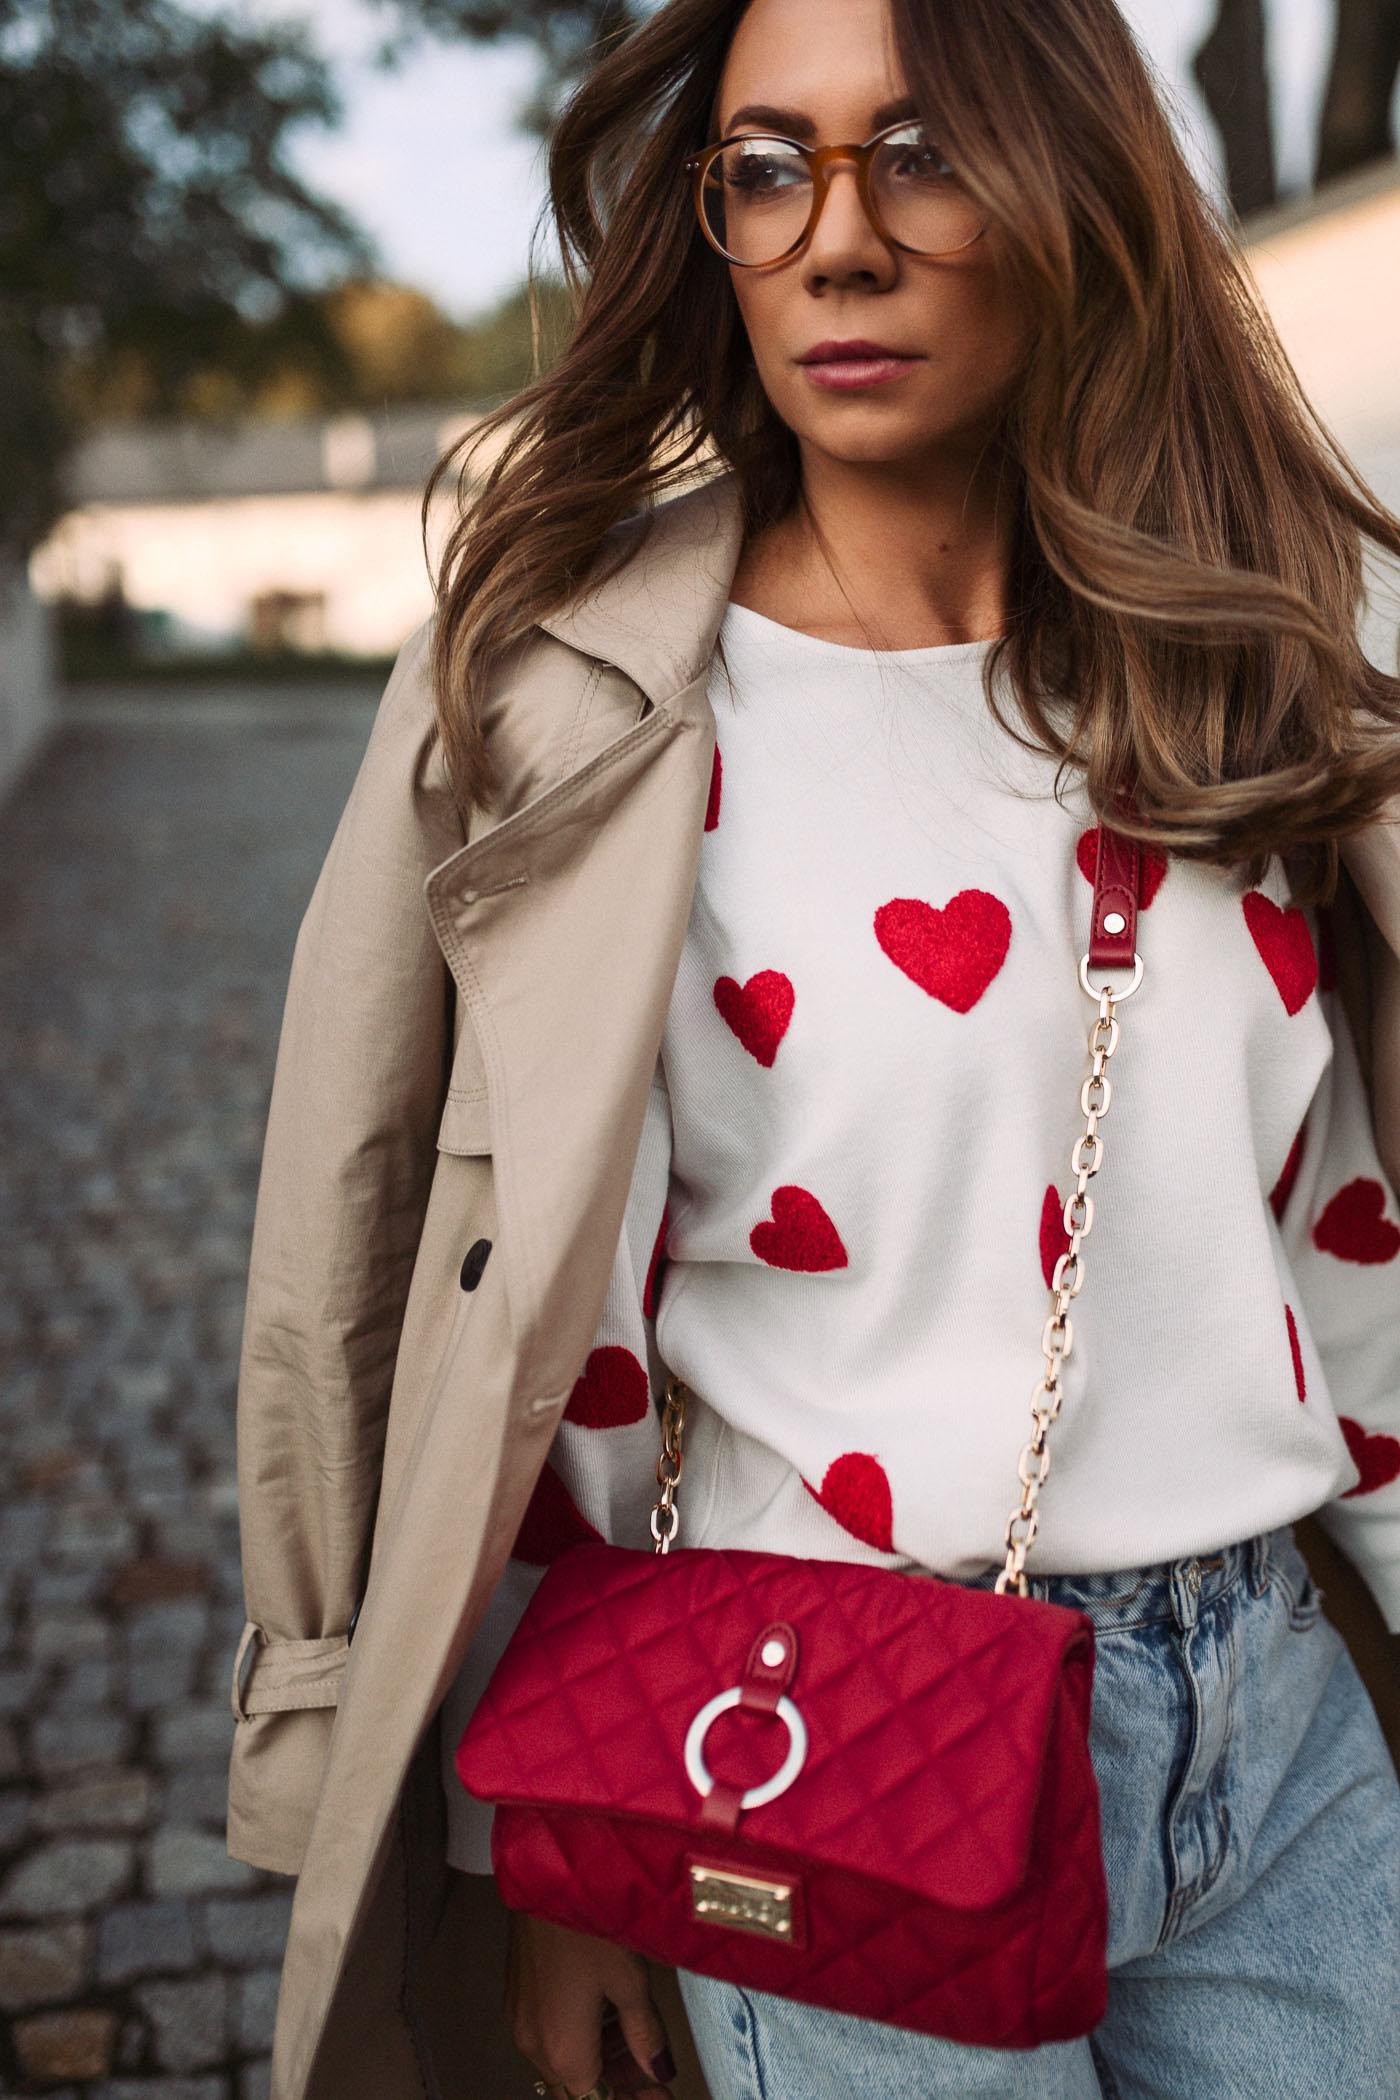 Sweter w serca zara kids, spodnie mom fit pull&bear, torebka LIU JO, Trench Mohito, Mohito płaszcz, modna mama, Olivka blog, stylowy blog